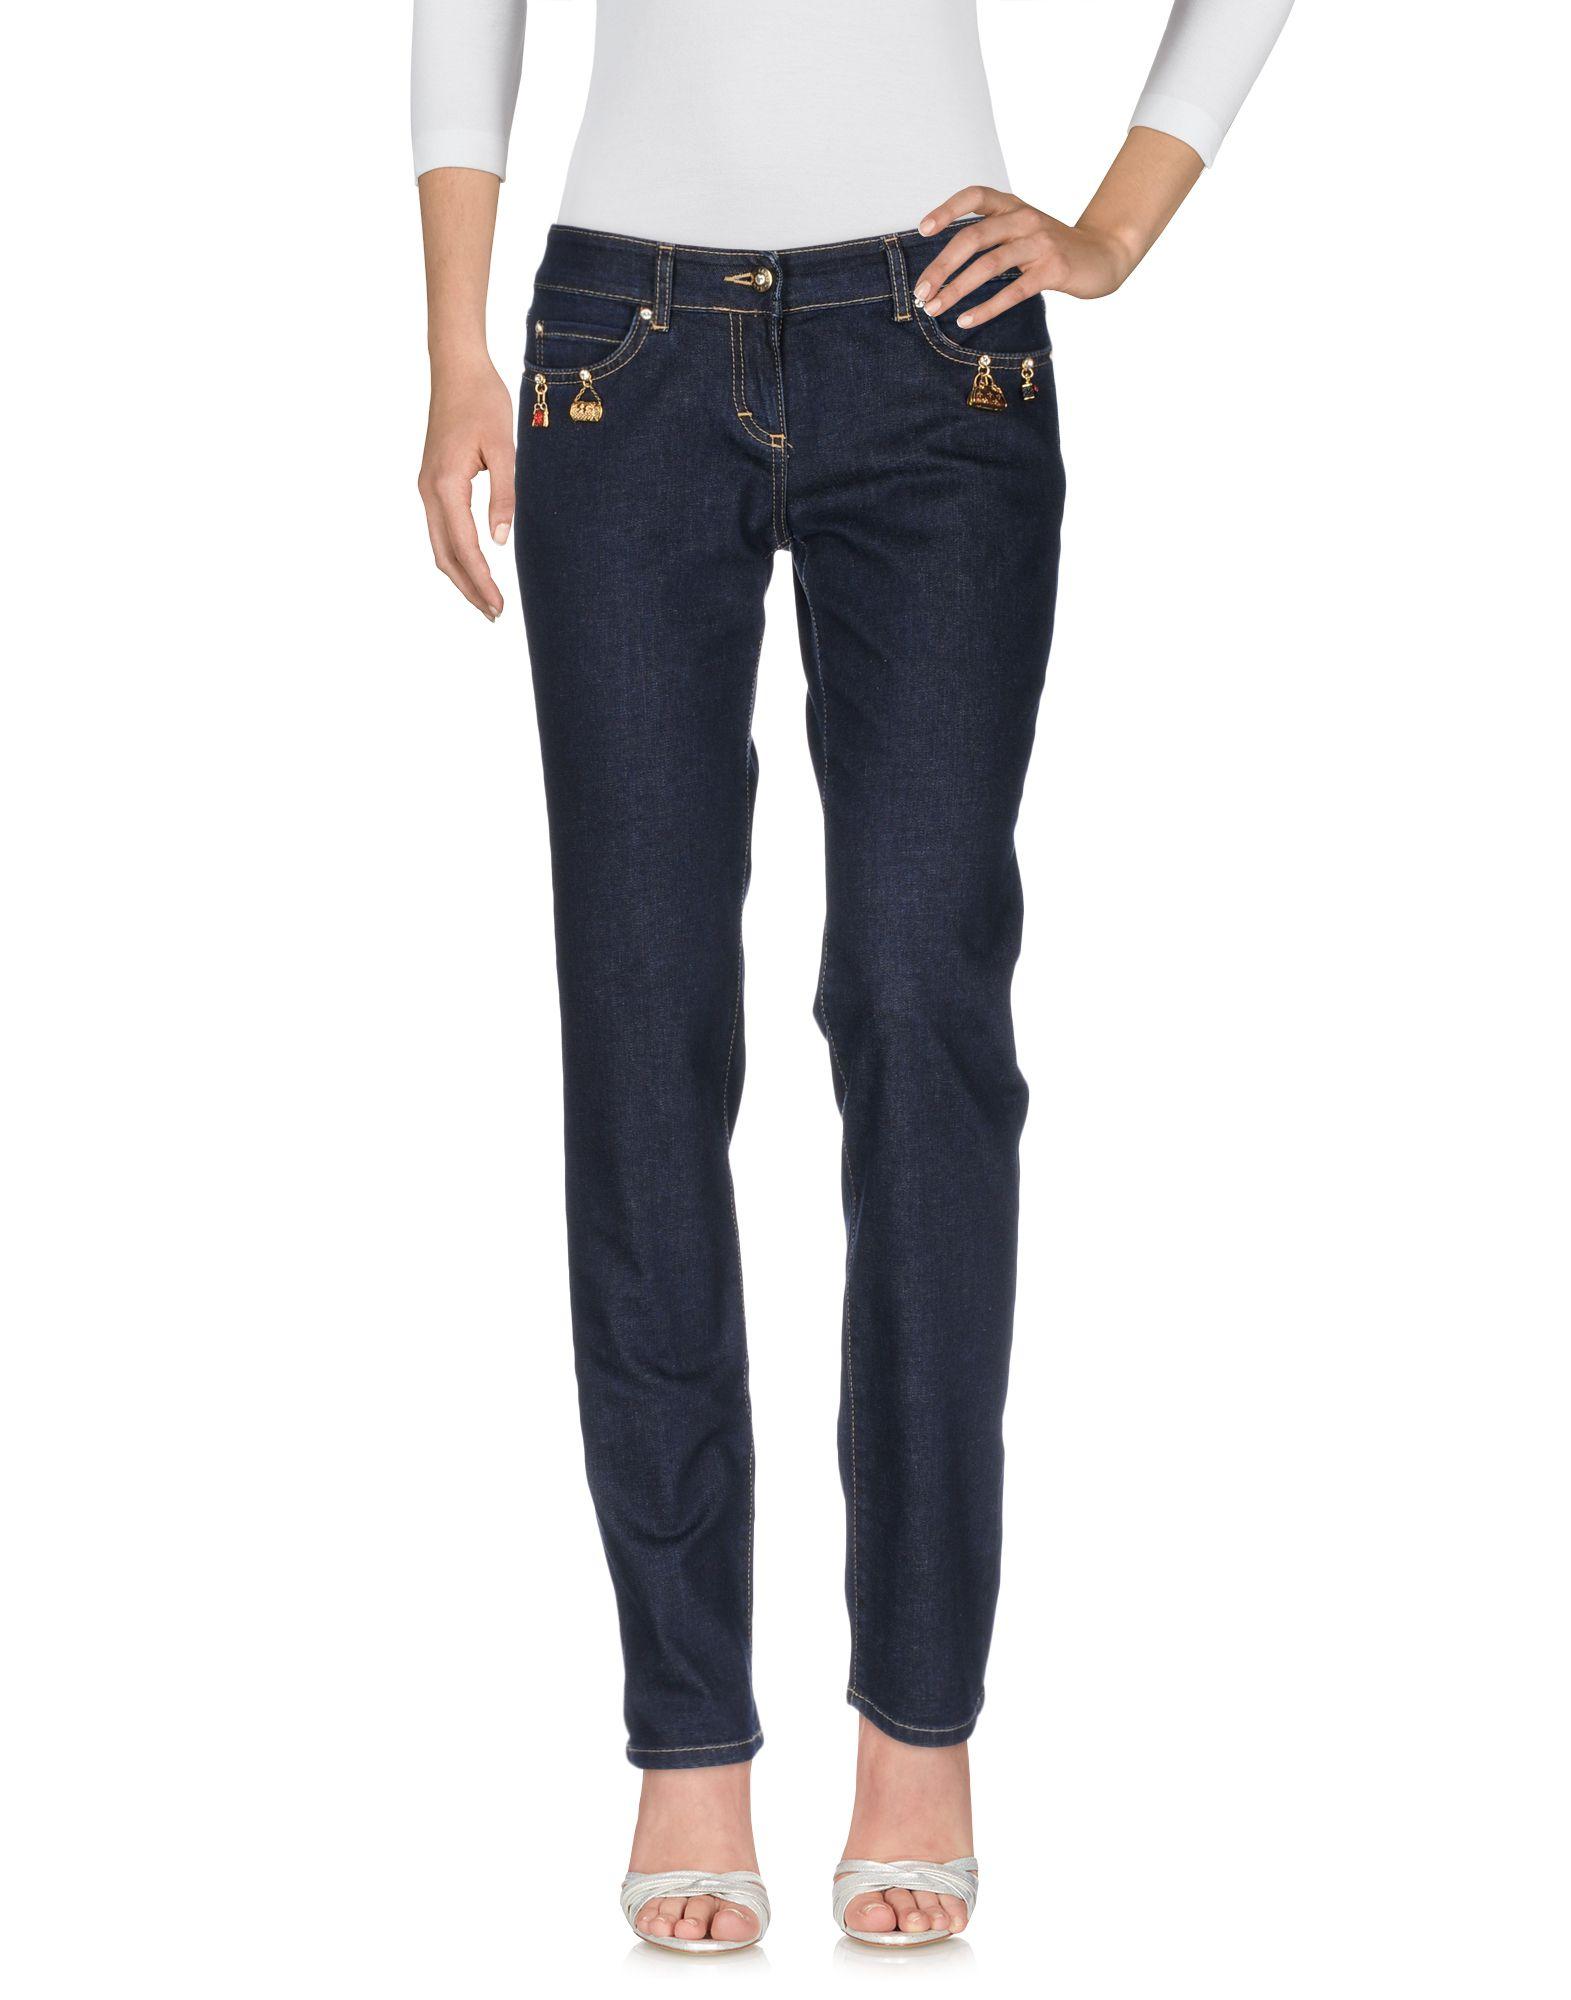 EAN 13 Джинсовые брюки 216bbua76010400 варежки 12 ean 4690462443994